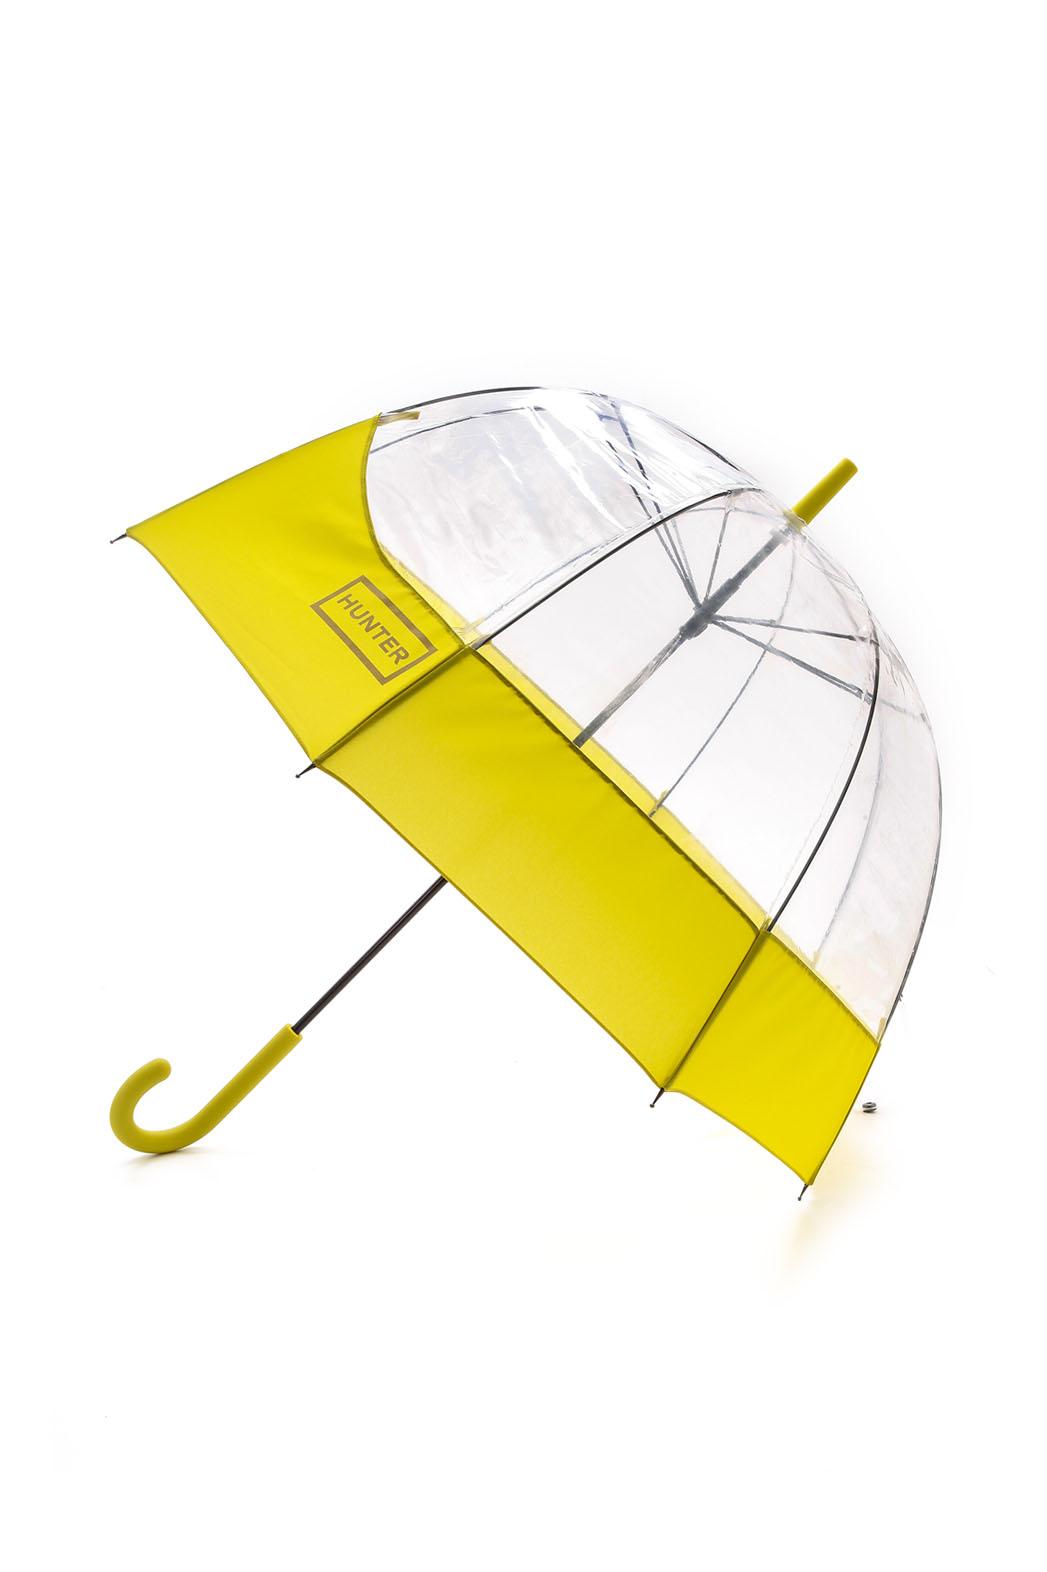 Rainy Day Essentials Main - P 2014